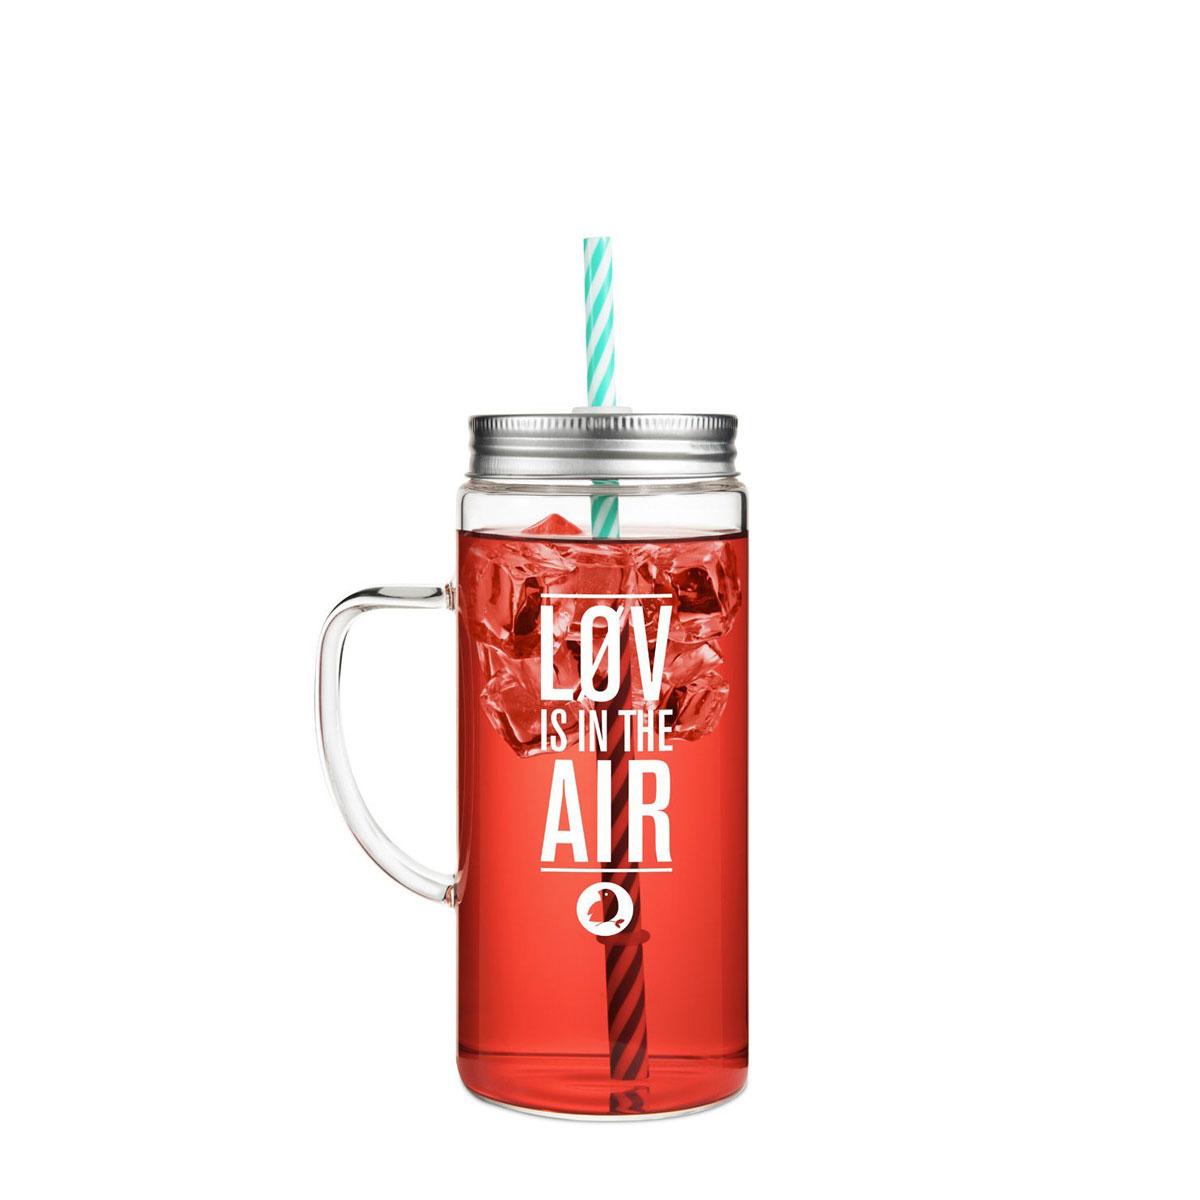 "Glas mit Strohhalm ""Løvely Jar"" aus Borosilikatglas von Løv Organic"